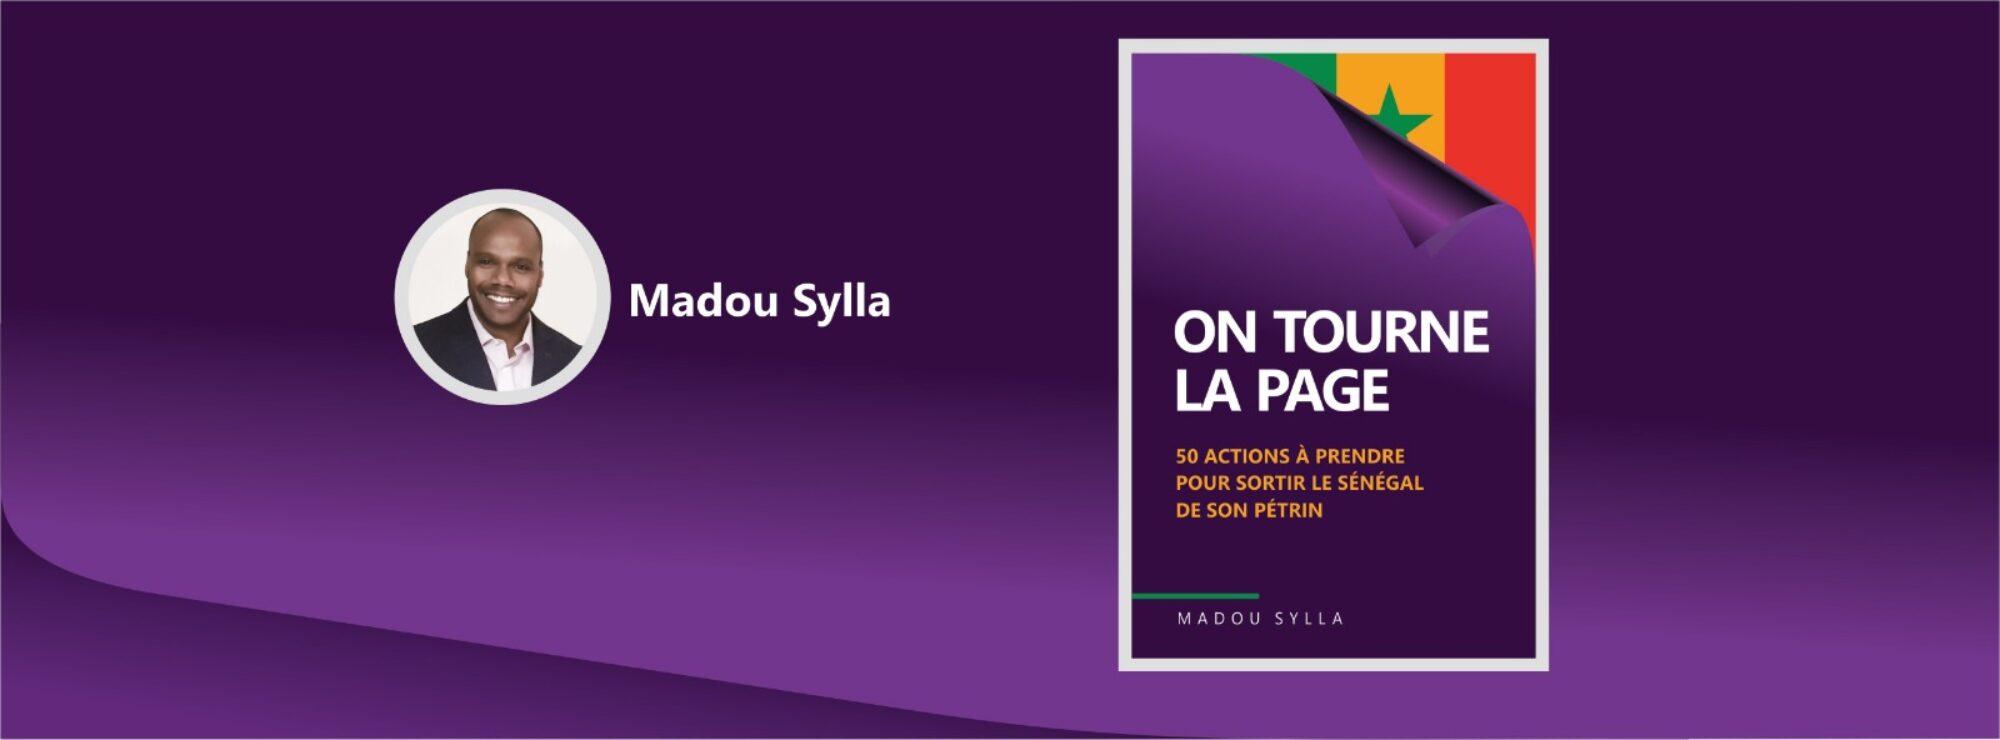 Madou Sylla